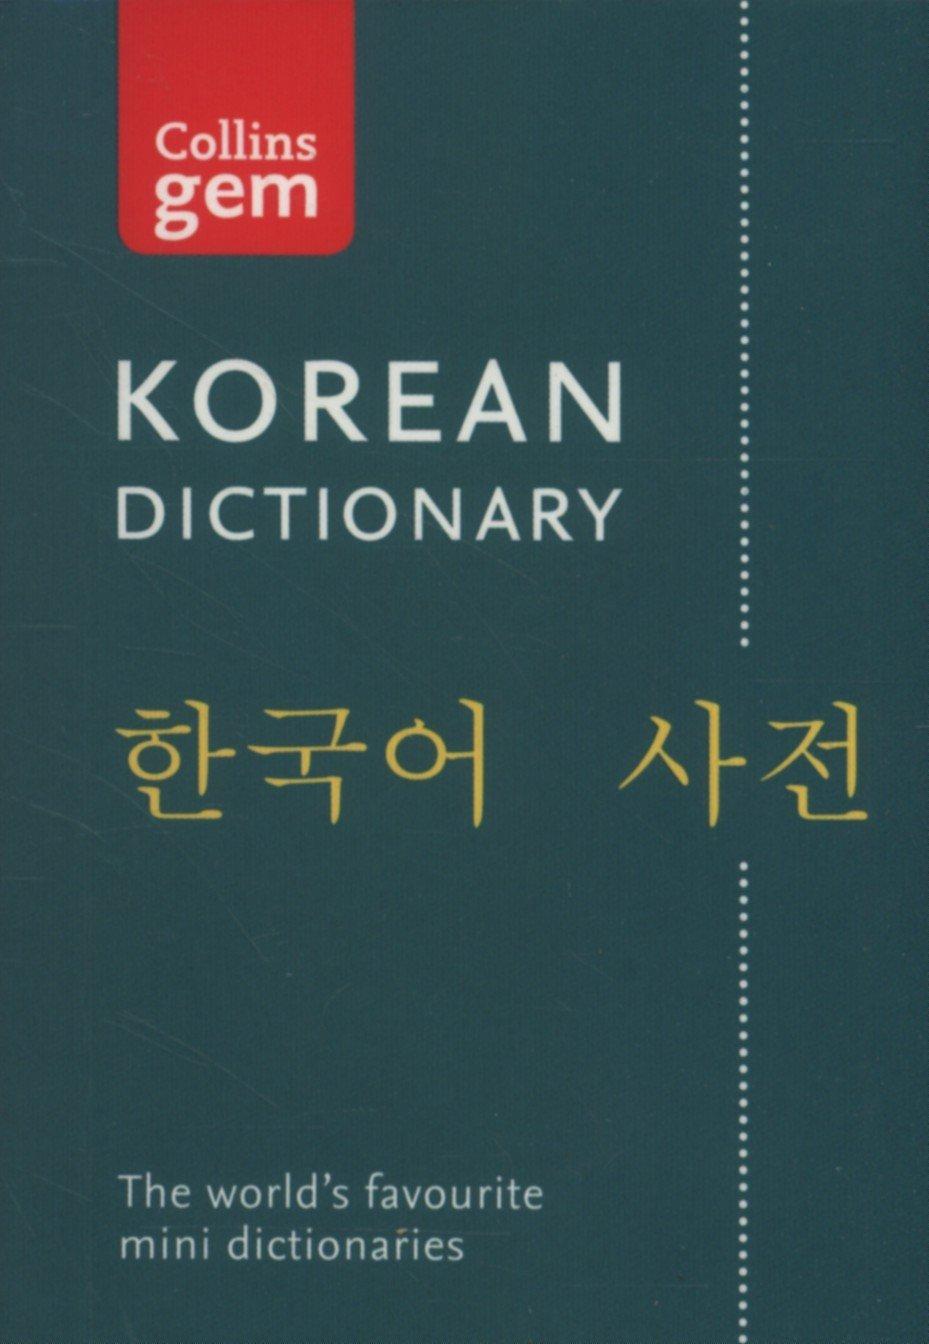 Collins Gem Korean Dictionary (Collins Gem): Amazon.co.uk: Collins  Dictionaries: 8601404394300: Books